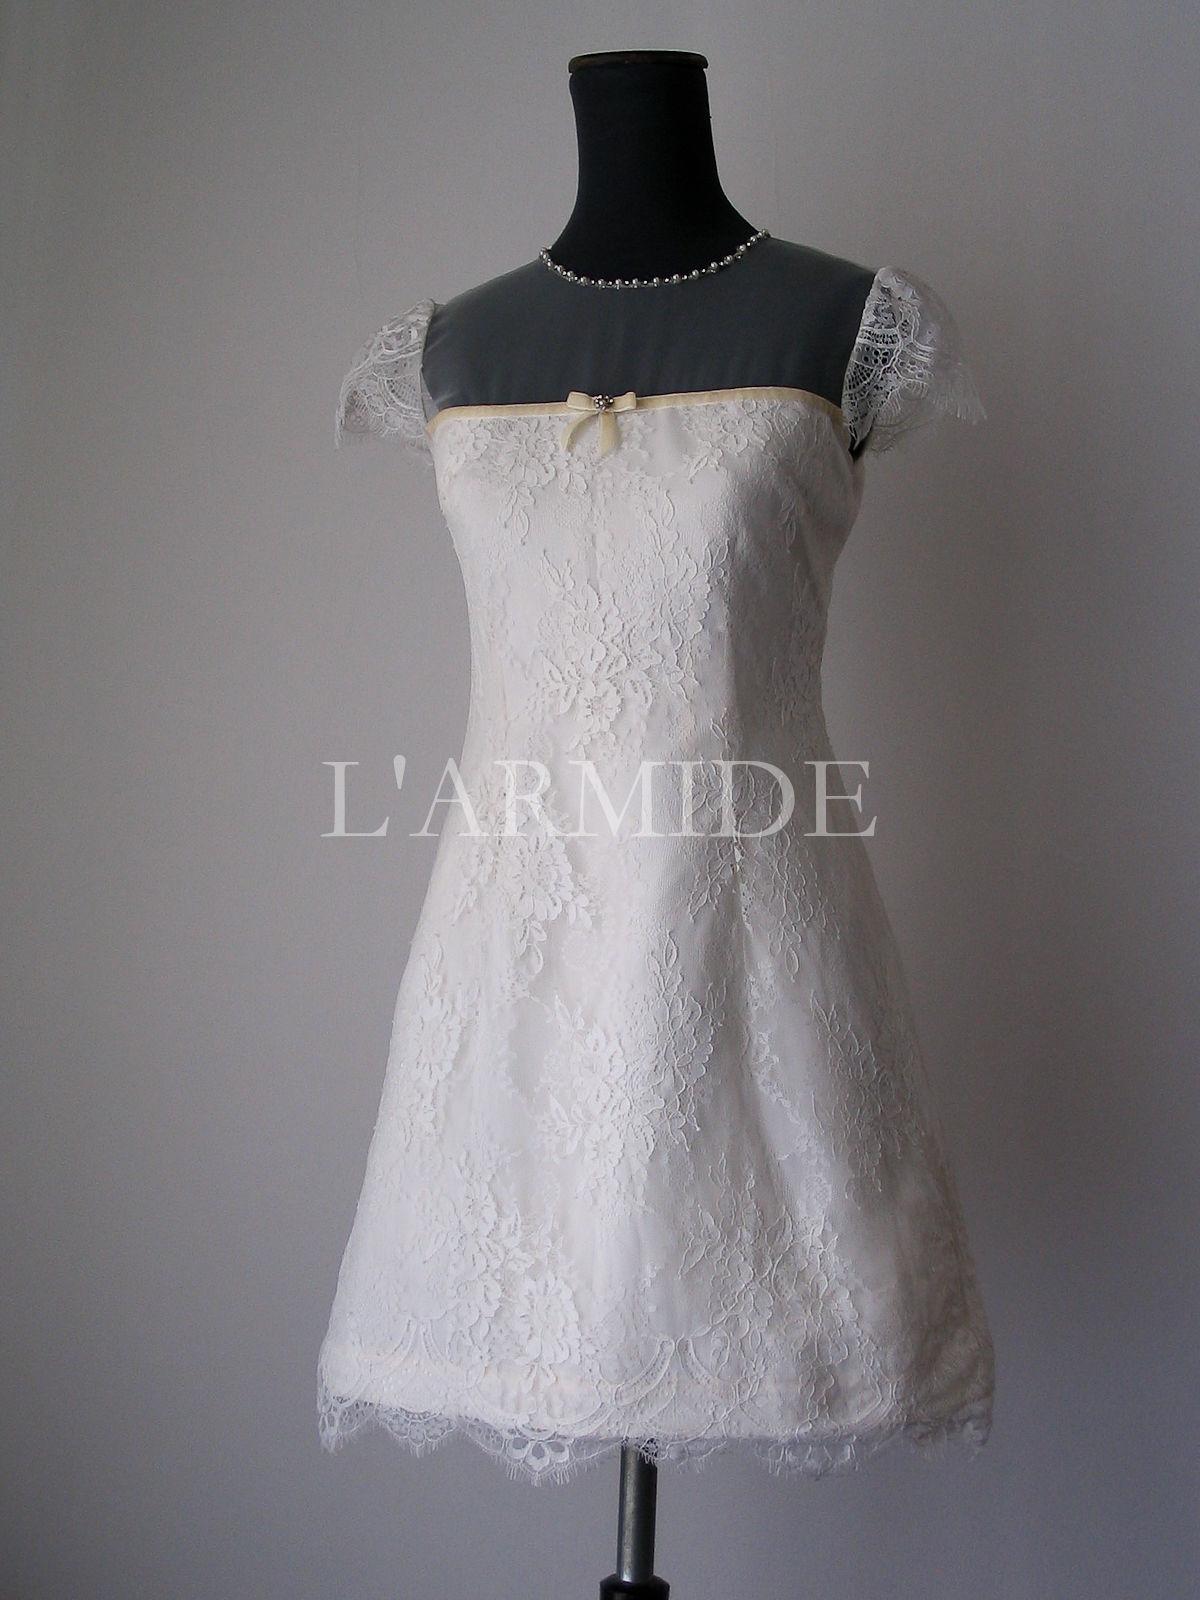 vestido-de-novia-corto-civil-buenos-aires-argentina-larmide-IMG_5172.jpg